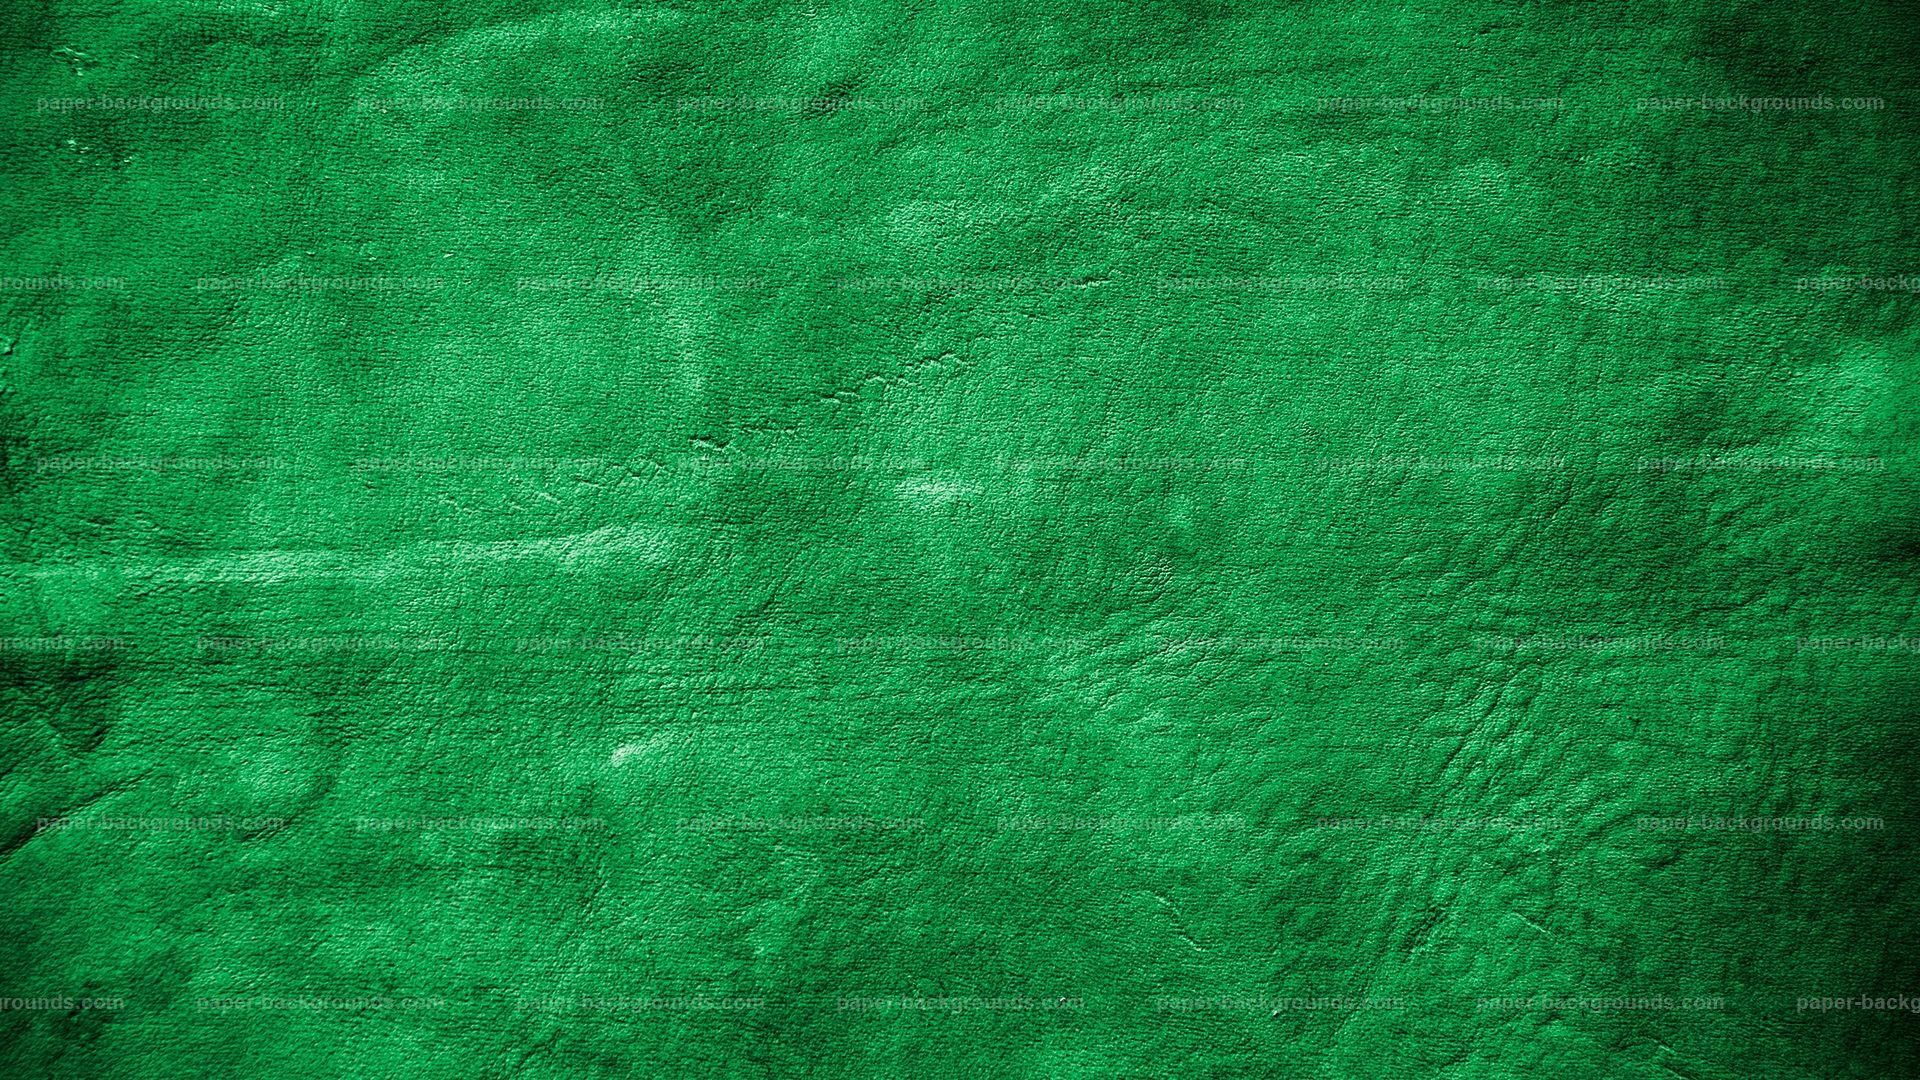 Mint Green wallpaper image